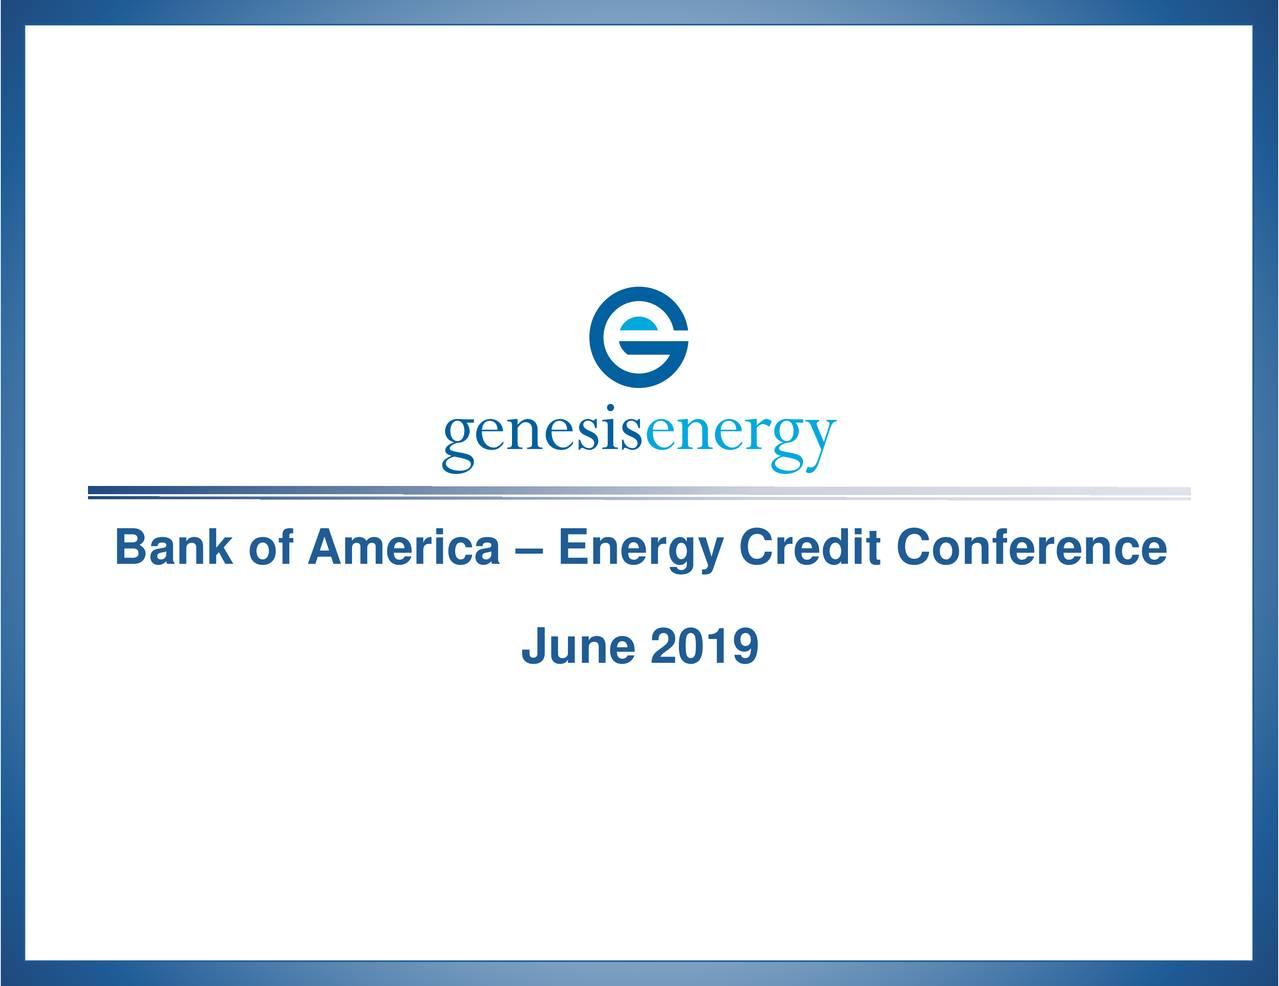 Genesis Energy (GEL) Presents At Bank of America Merrill Lynch 2019 Energy Credit Conference - Slideshow